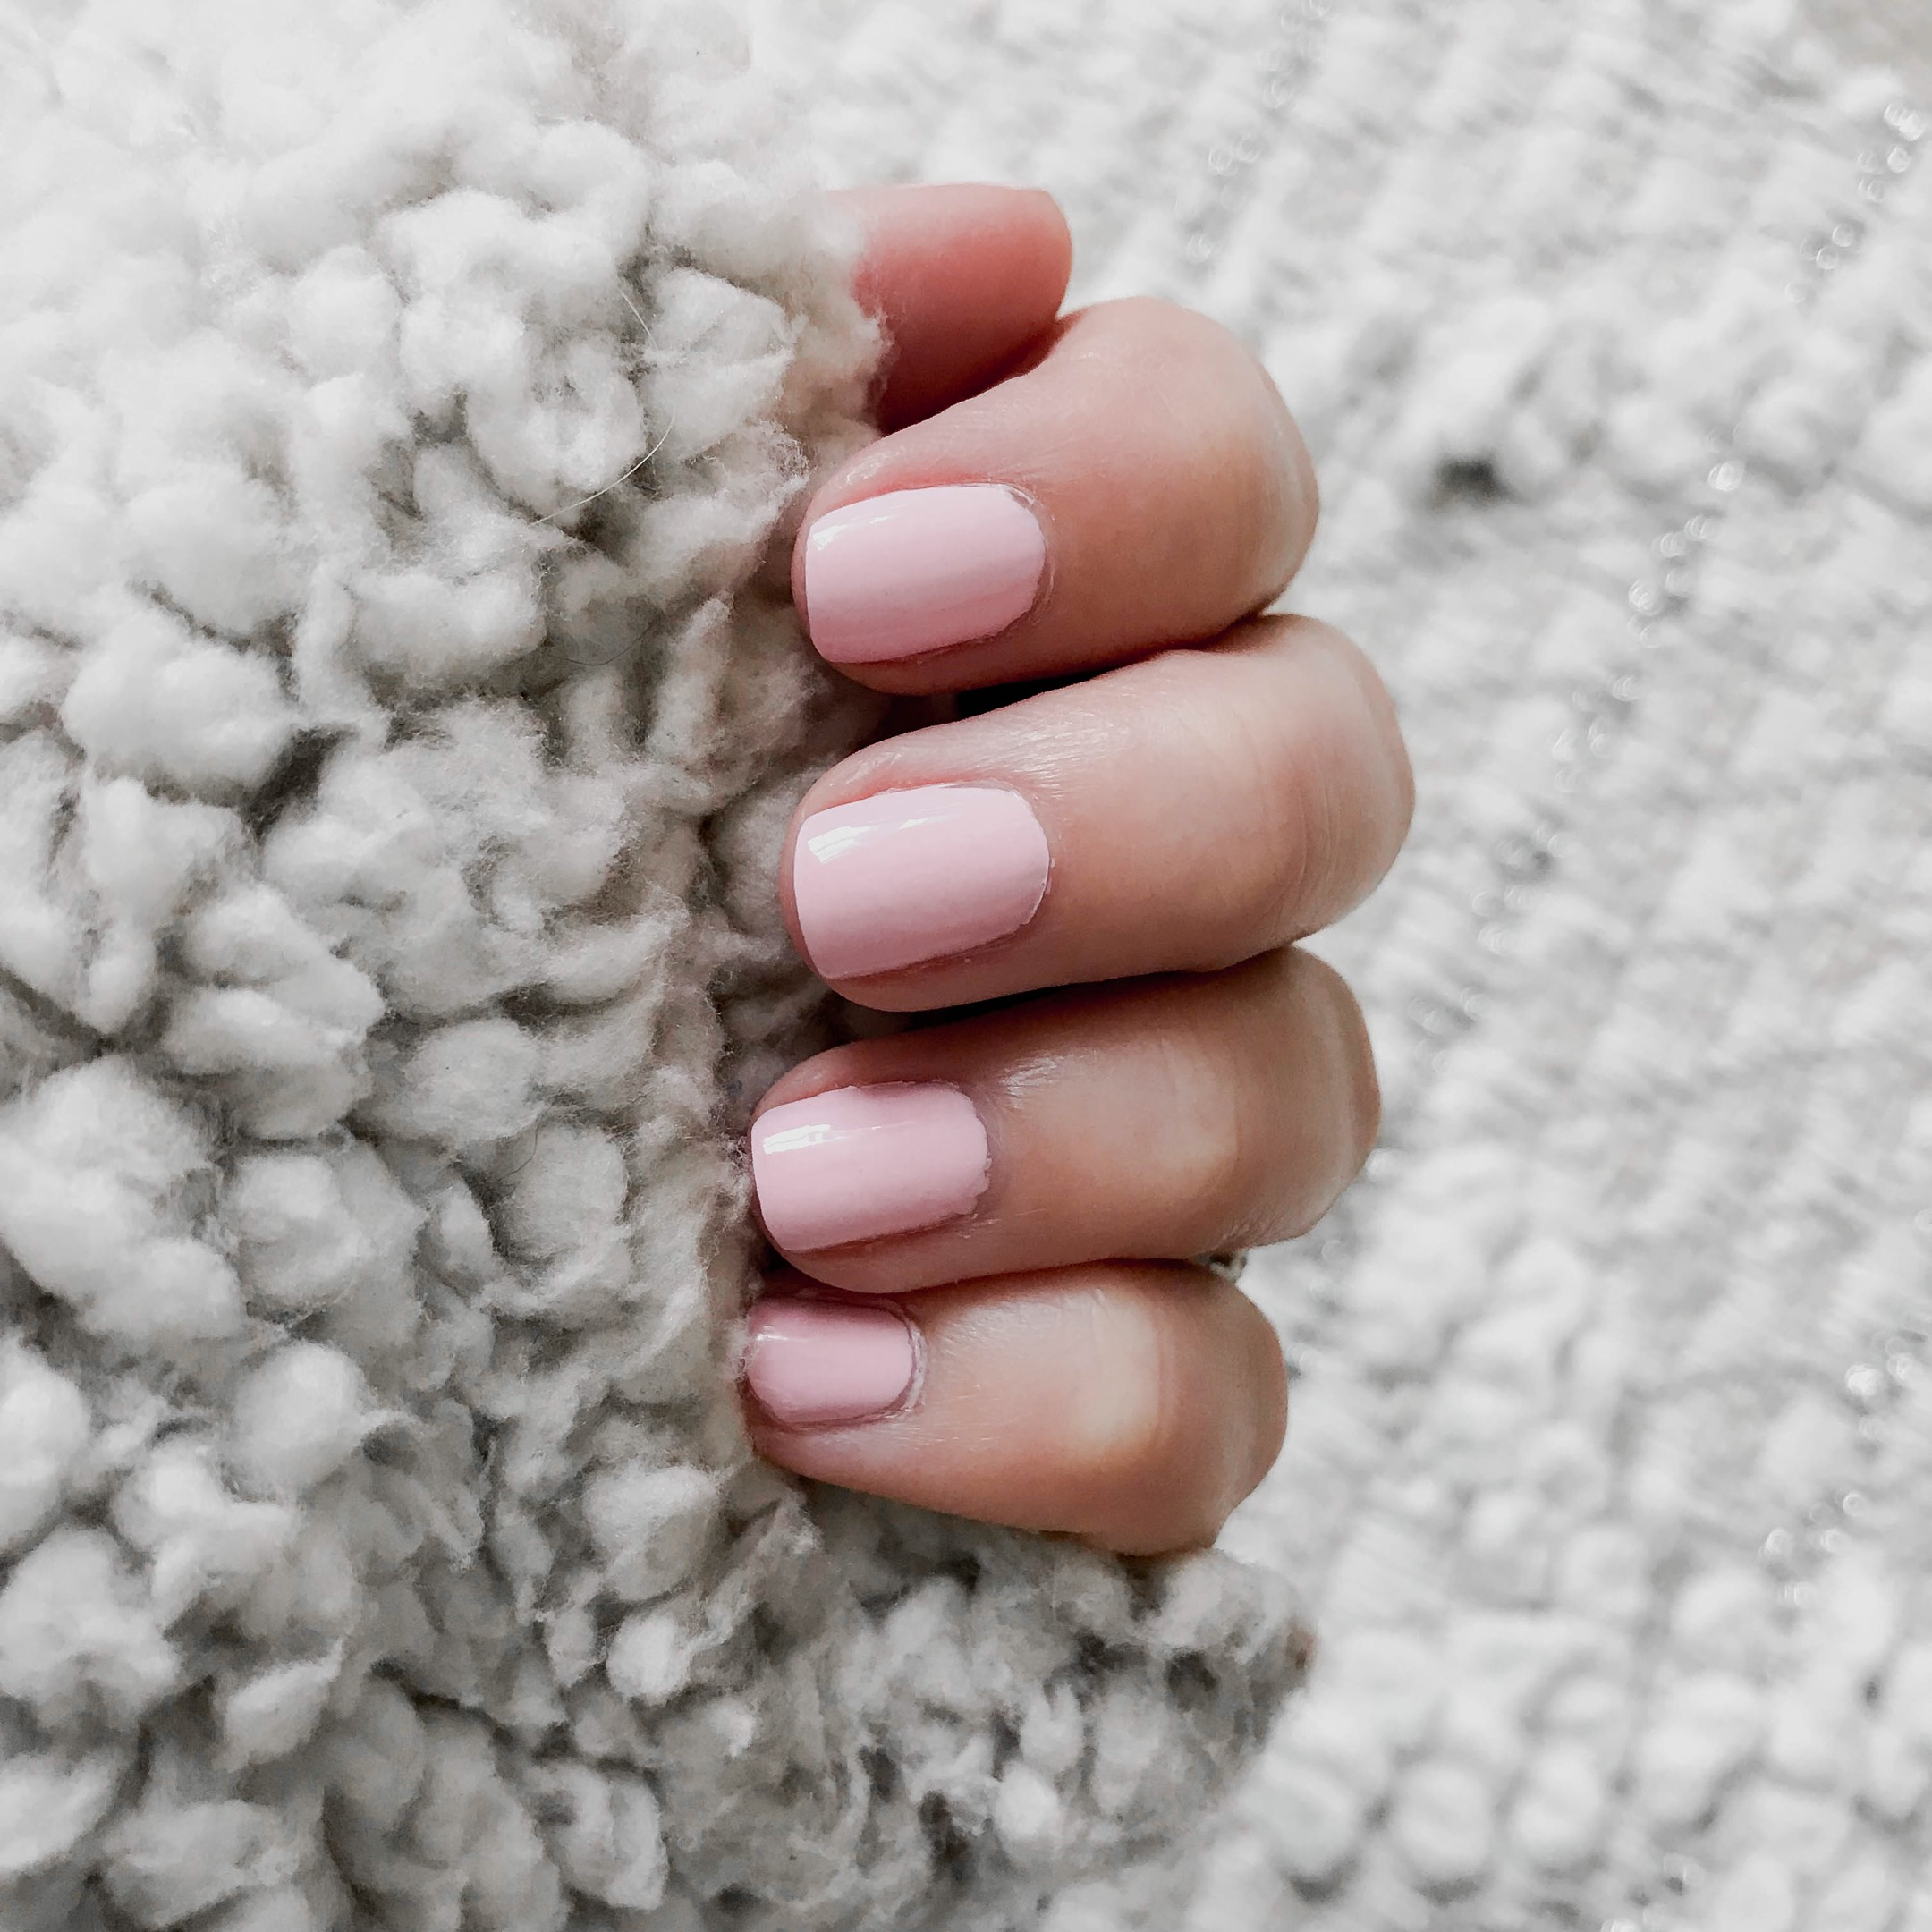 Instagram Round Up | Pine Barren Beauty | pink mani, natural nails, Essie Fiji, at home manicure